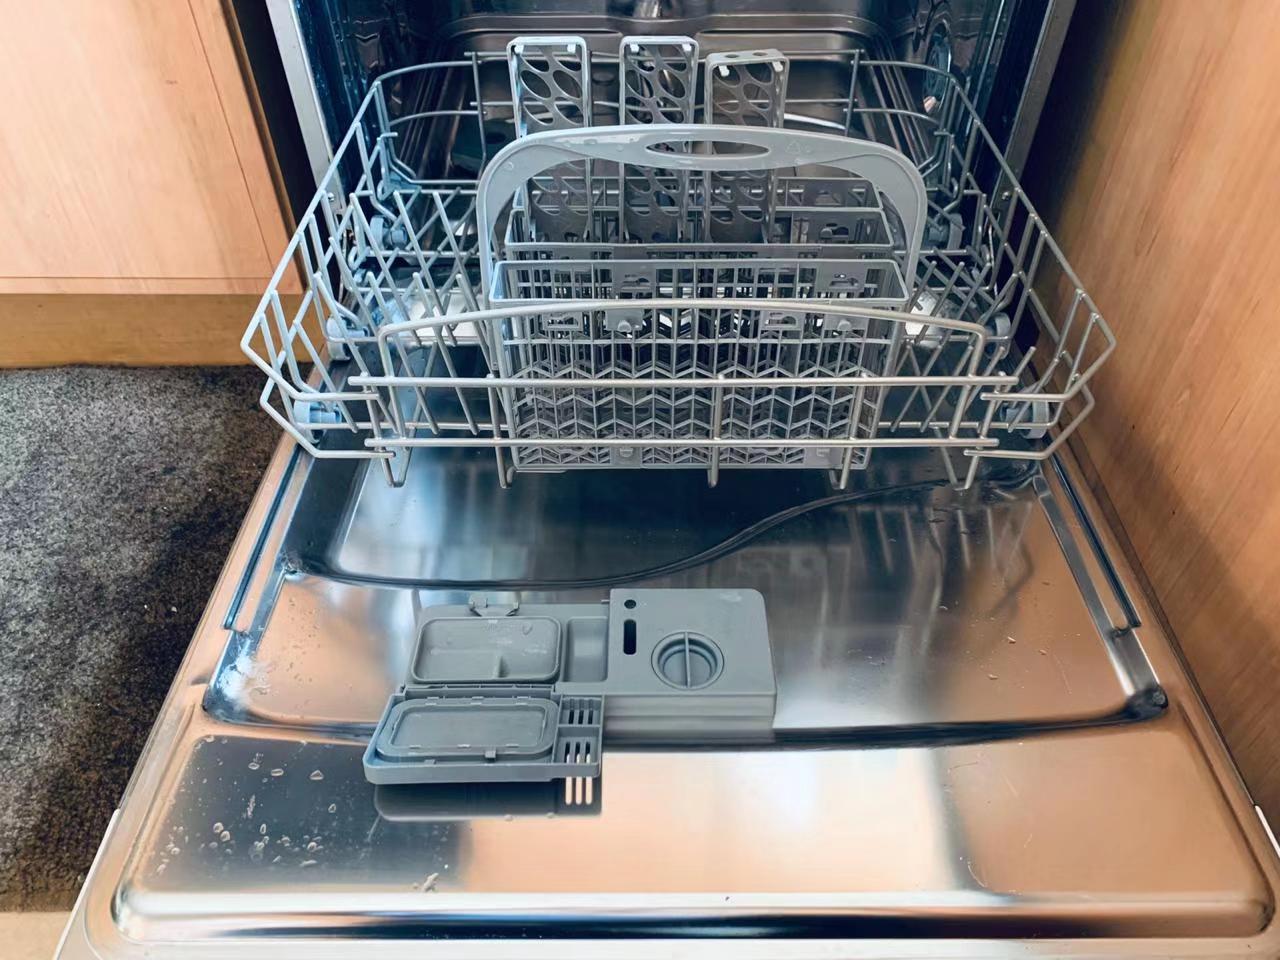 Kelvinator Dishwasher for sale @R3500 ONO Pretoria east Tel & whatsapp 0766868118